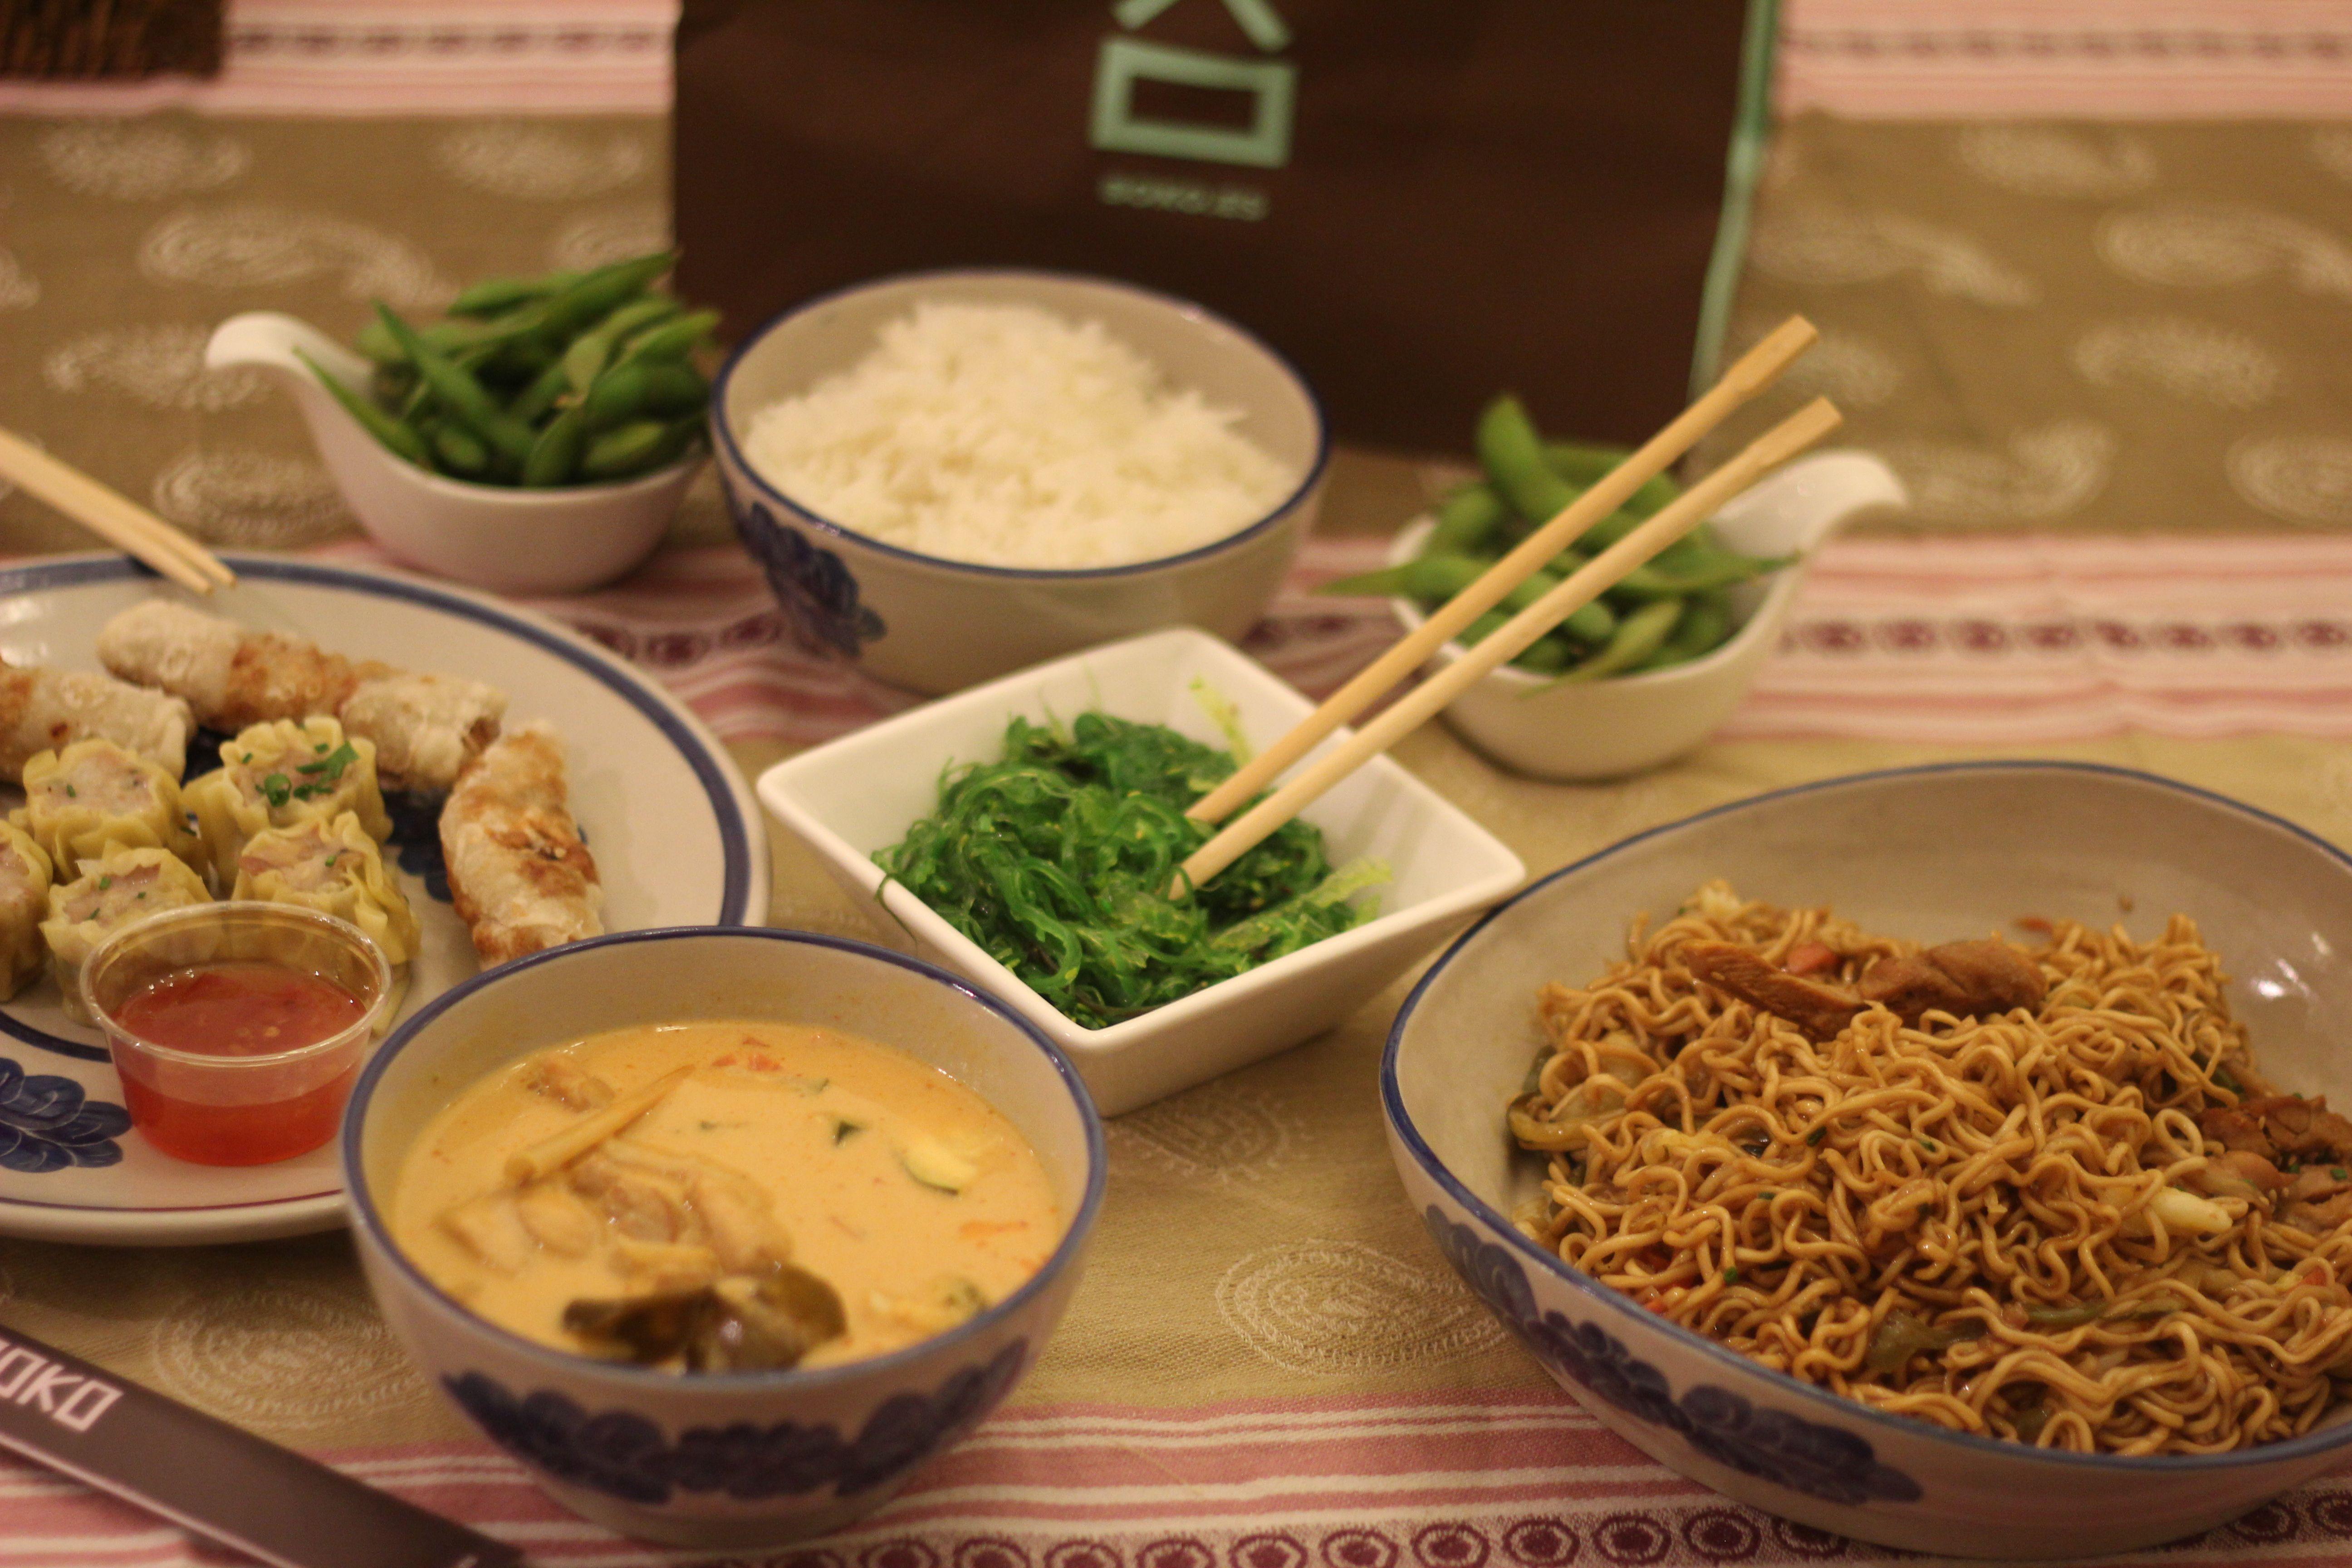 comida-asiatica-a-domicilio